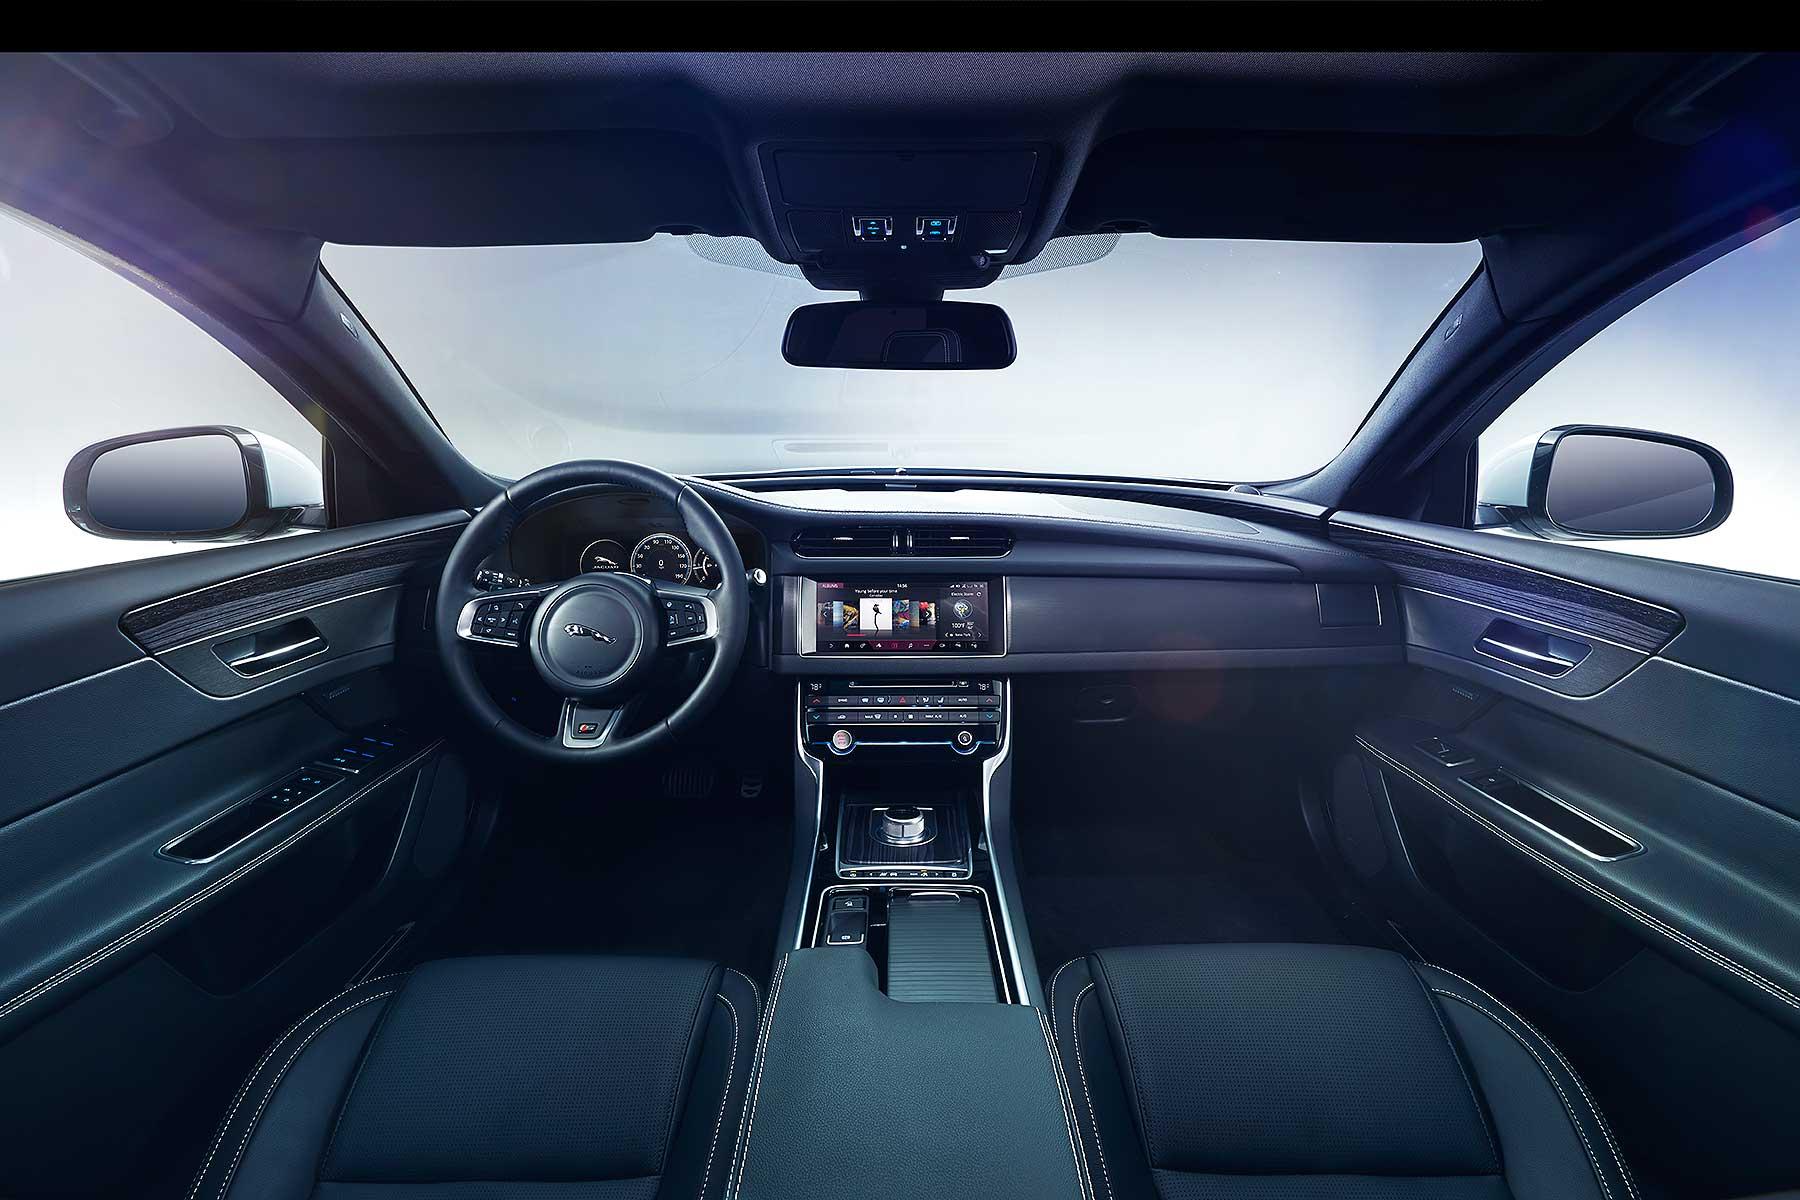 2015 Jaguar XF S teaser